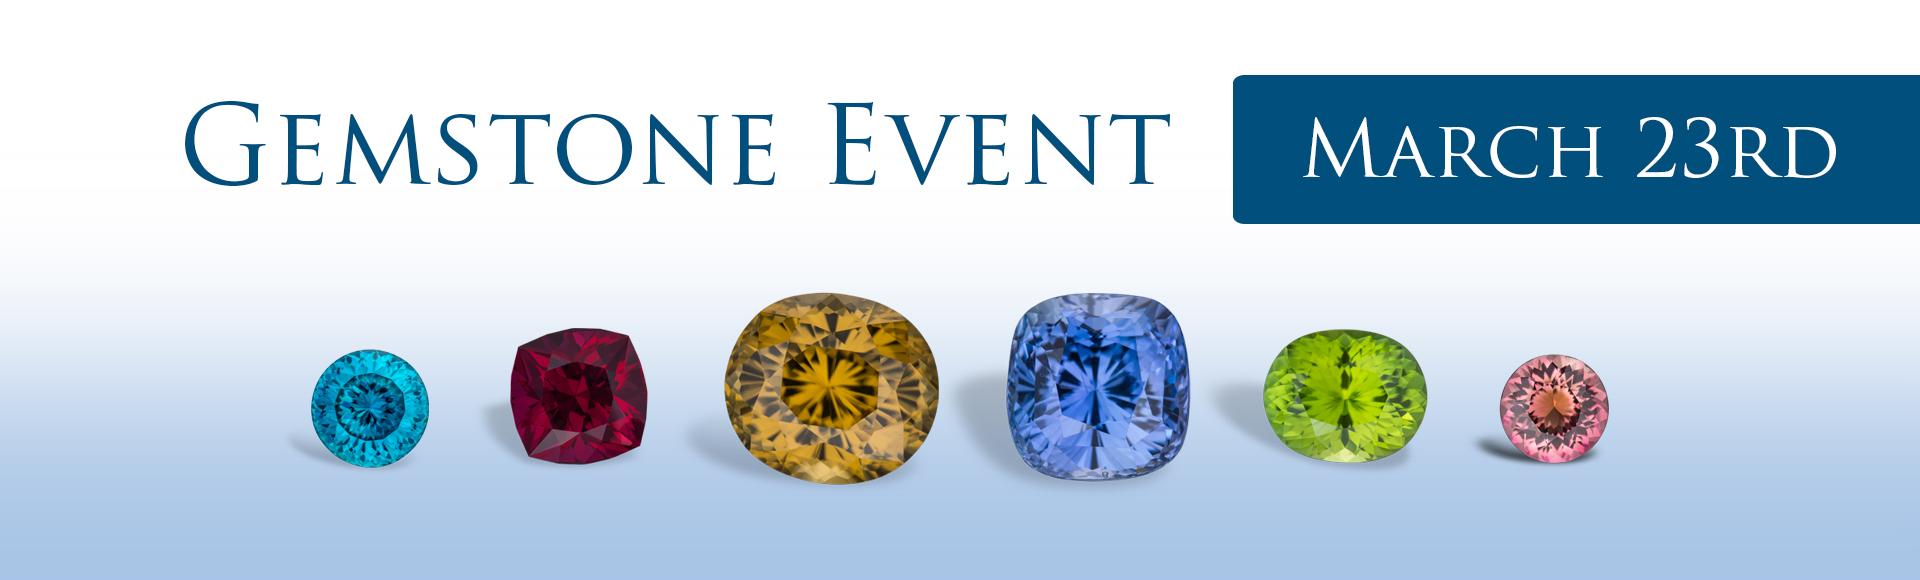 Gemstone Event 2017